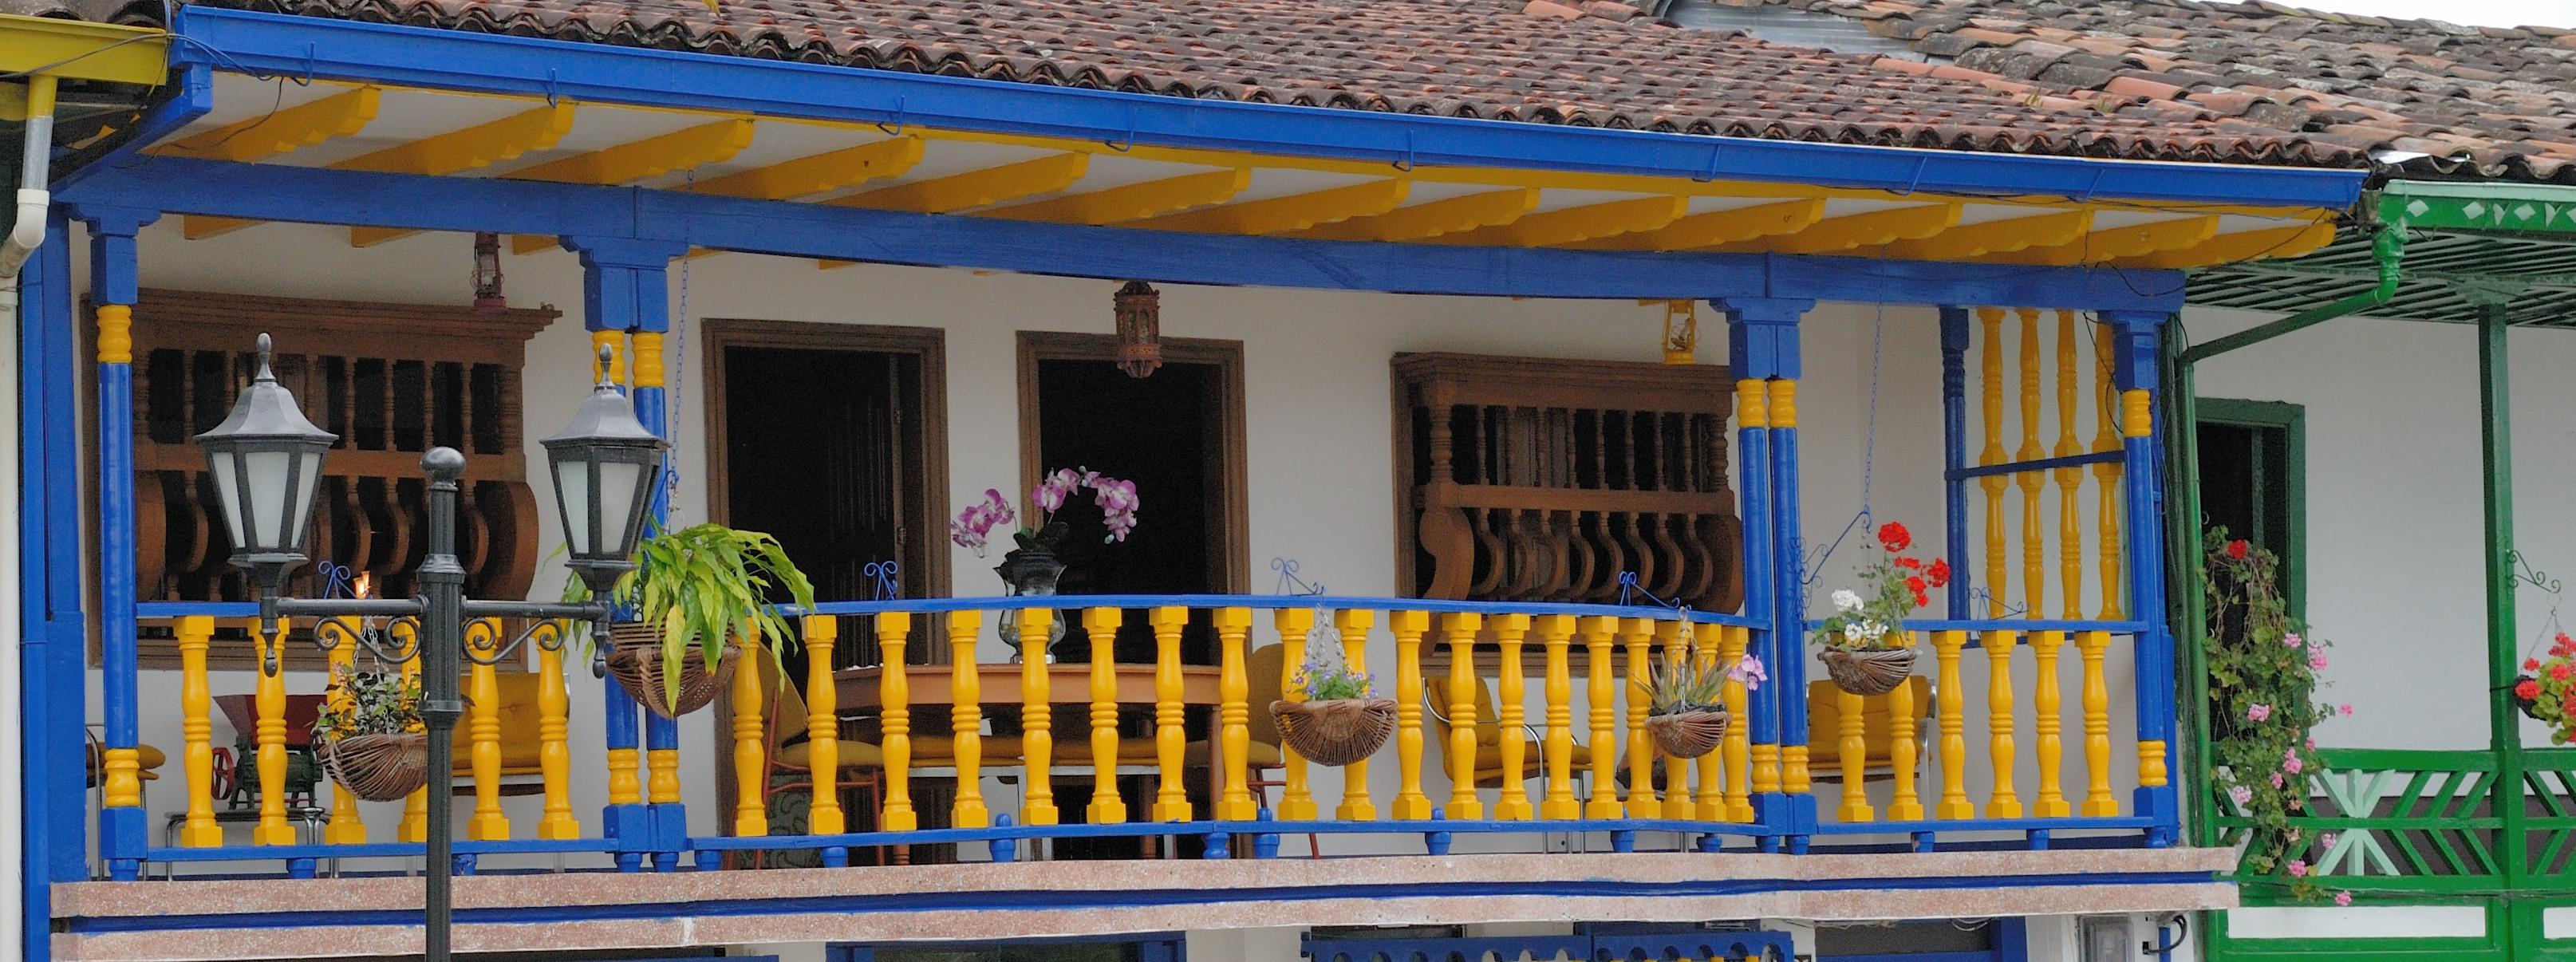 http://www.kontour-travel.com/wp-content/uploads/zona-cafetera-salento-house.jpg